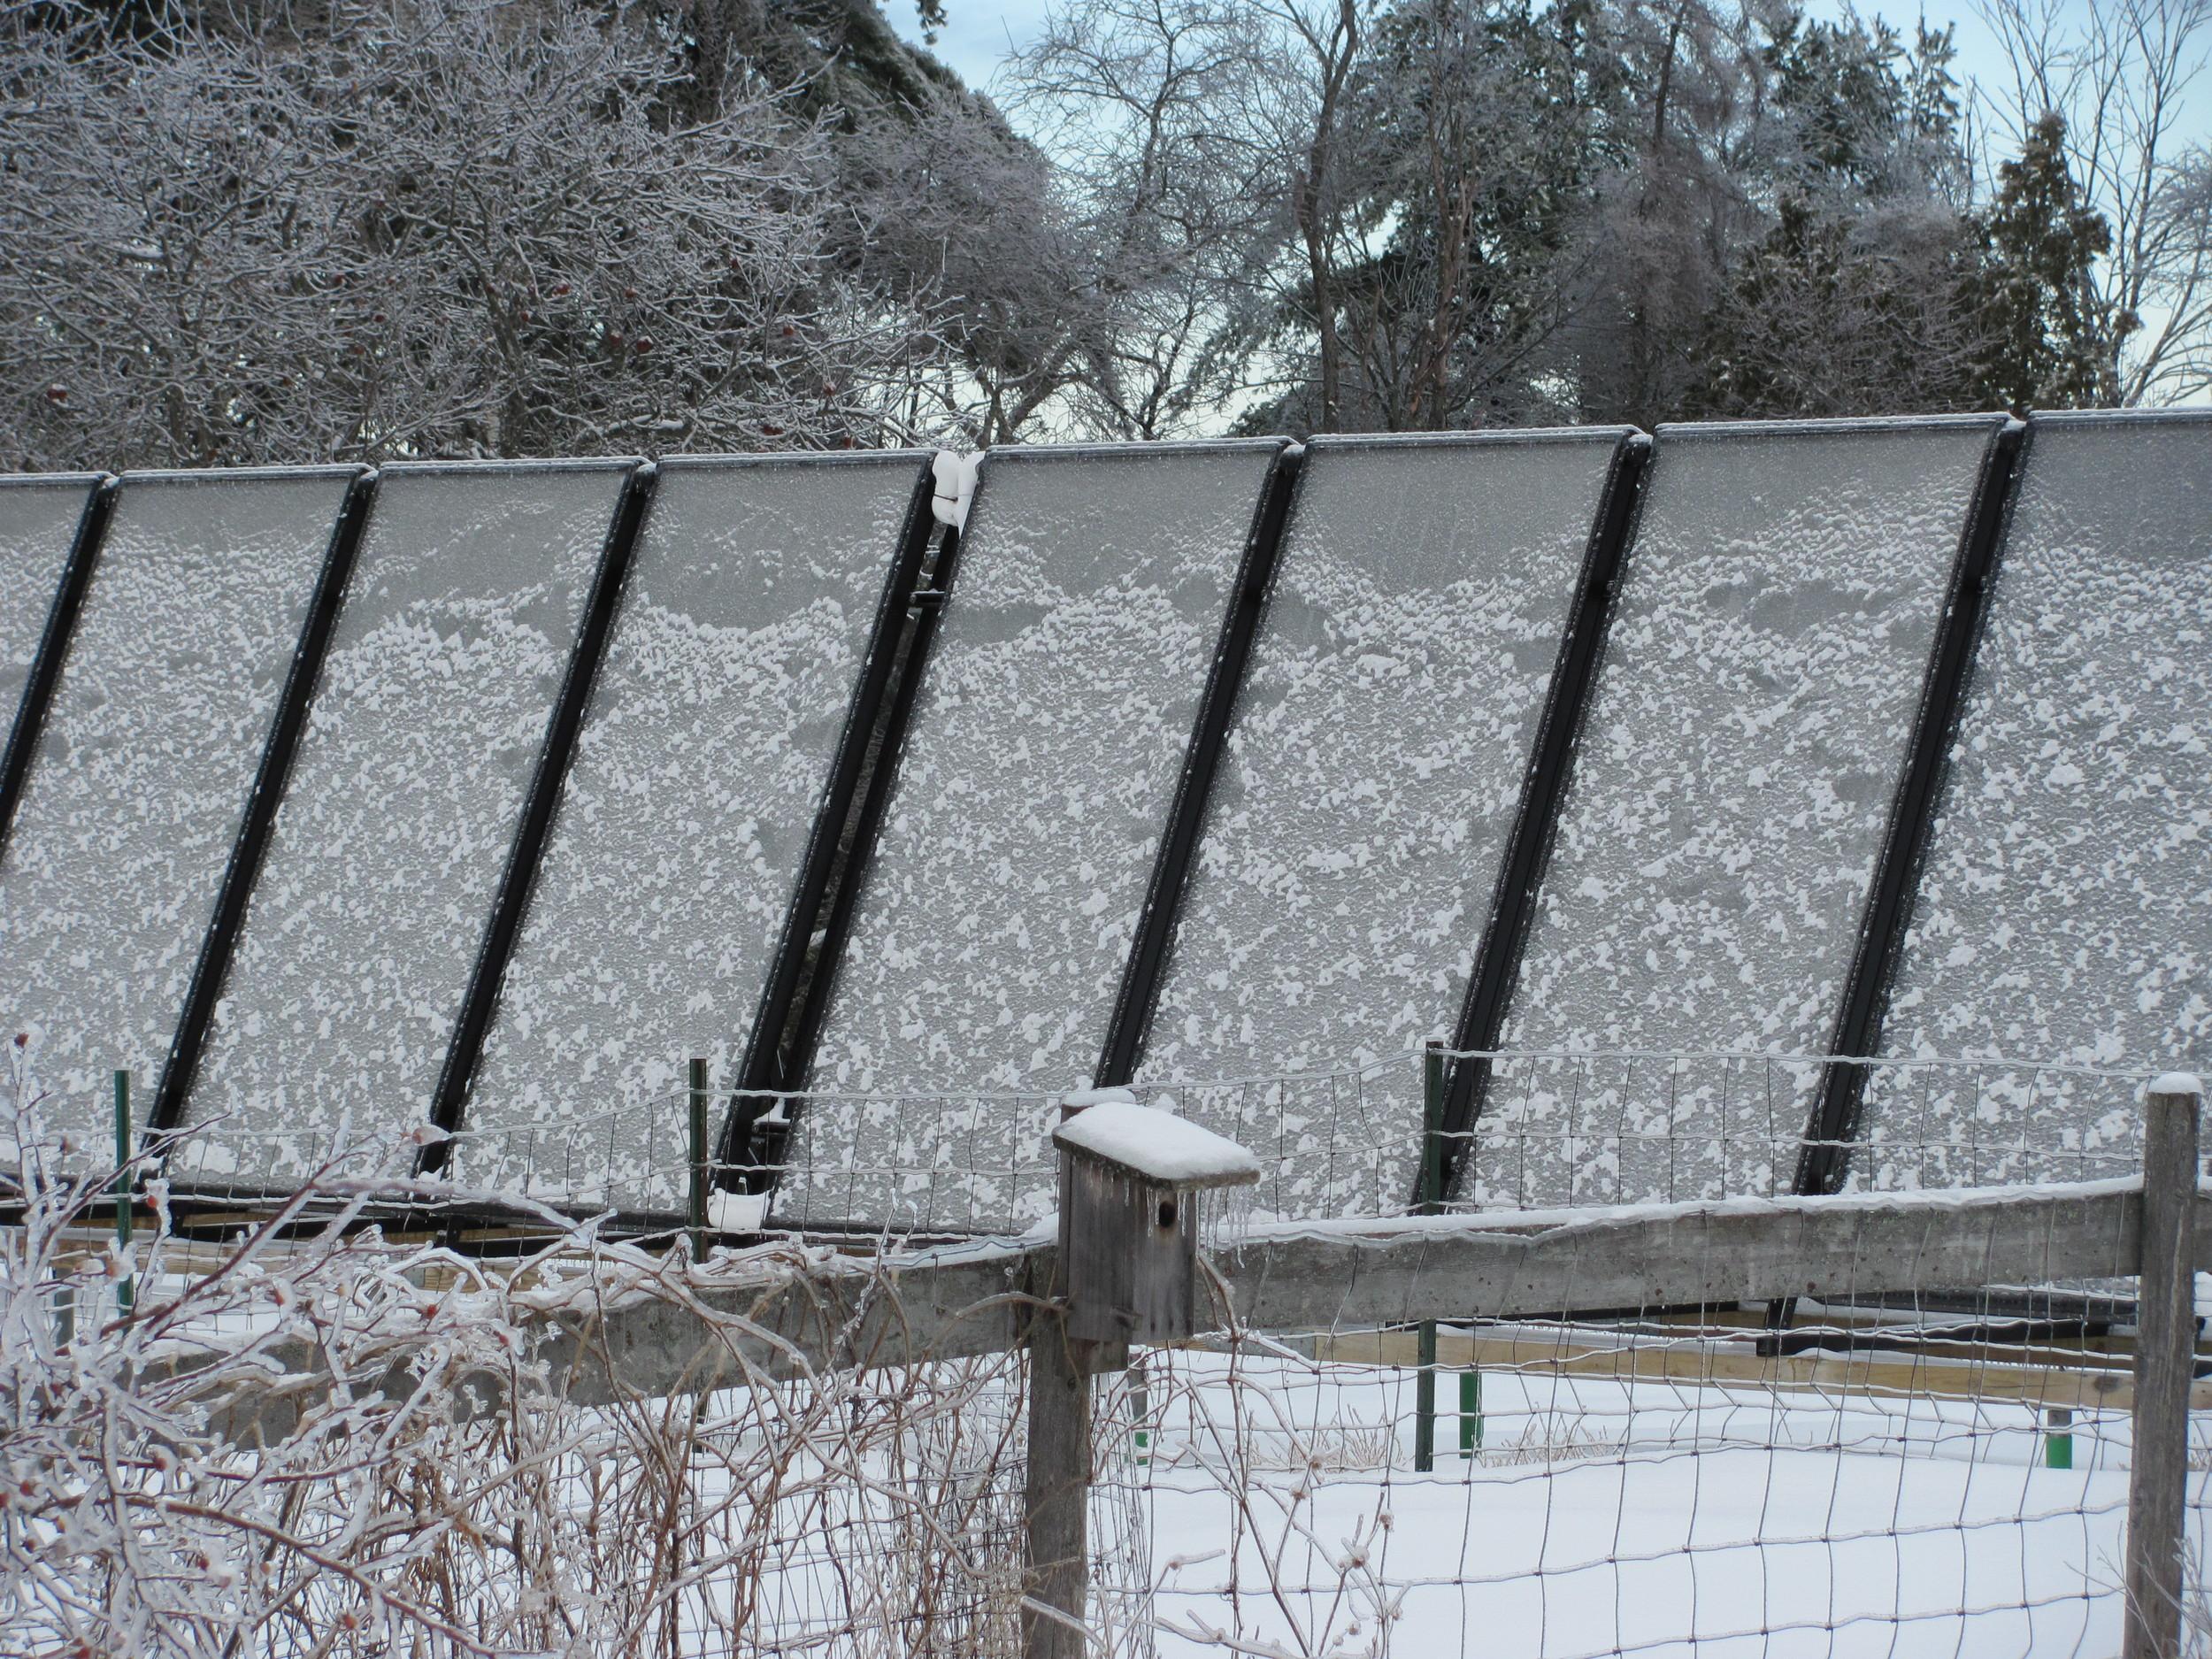 Nice try, solar panels.